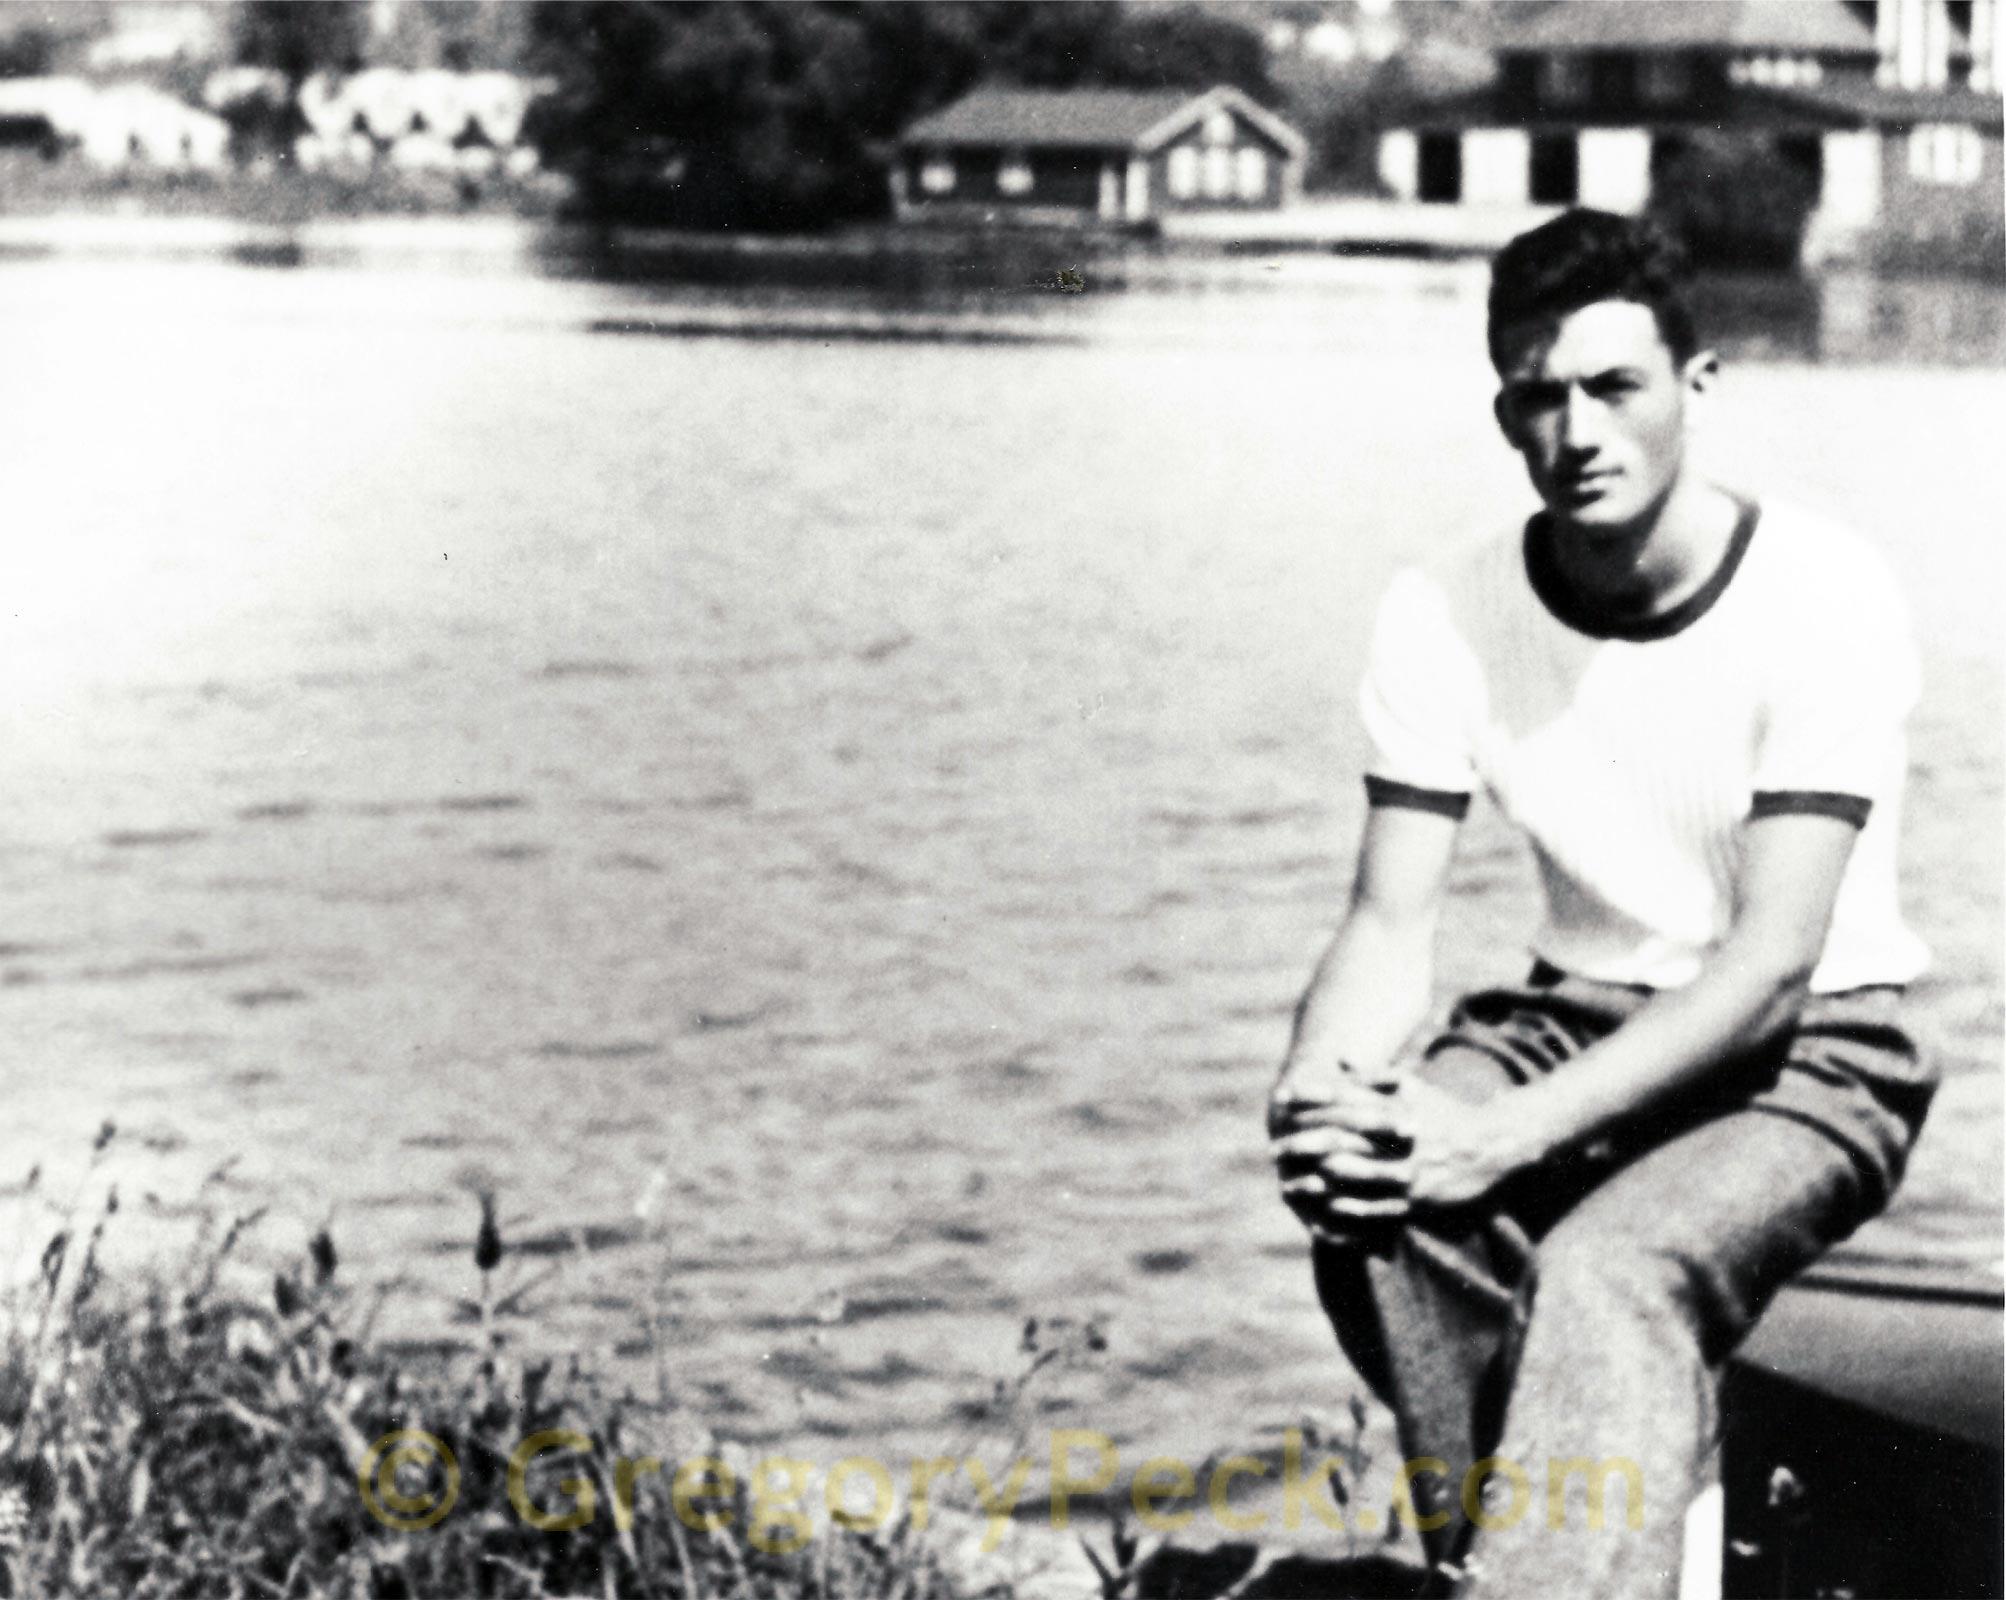 Greg age 19